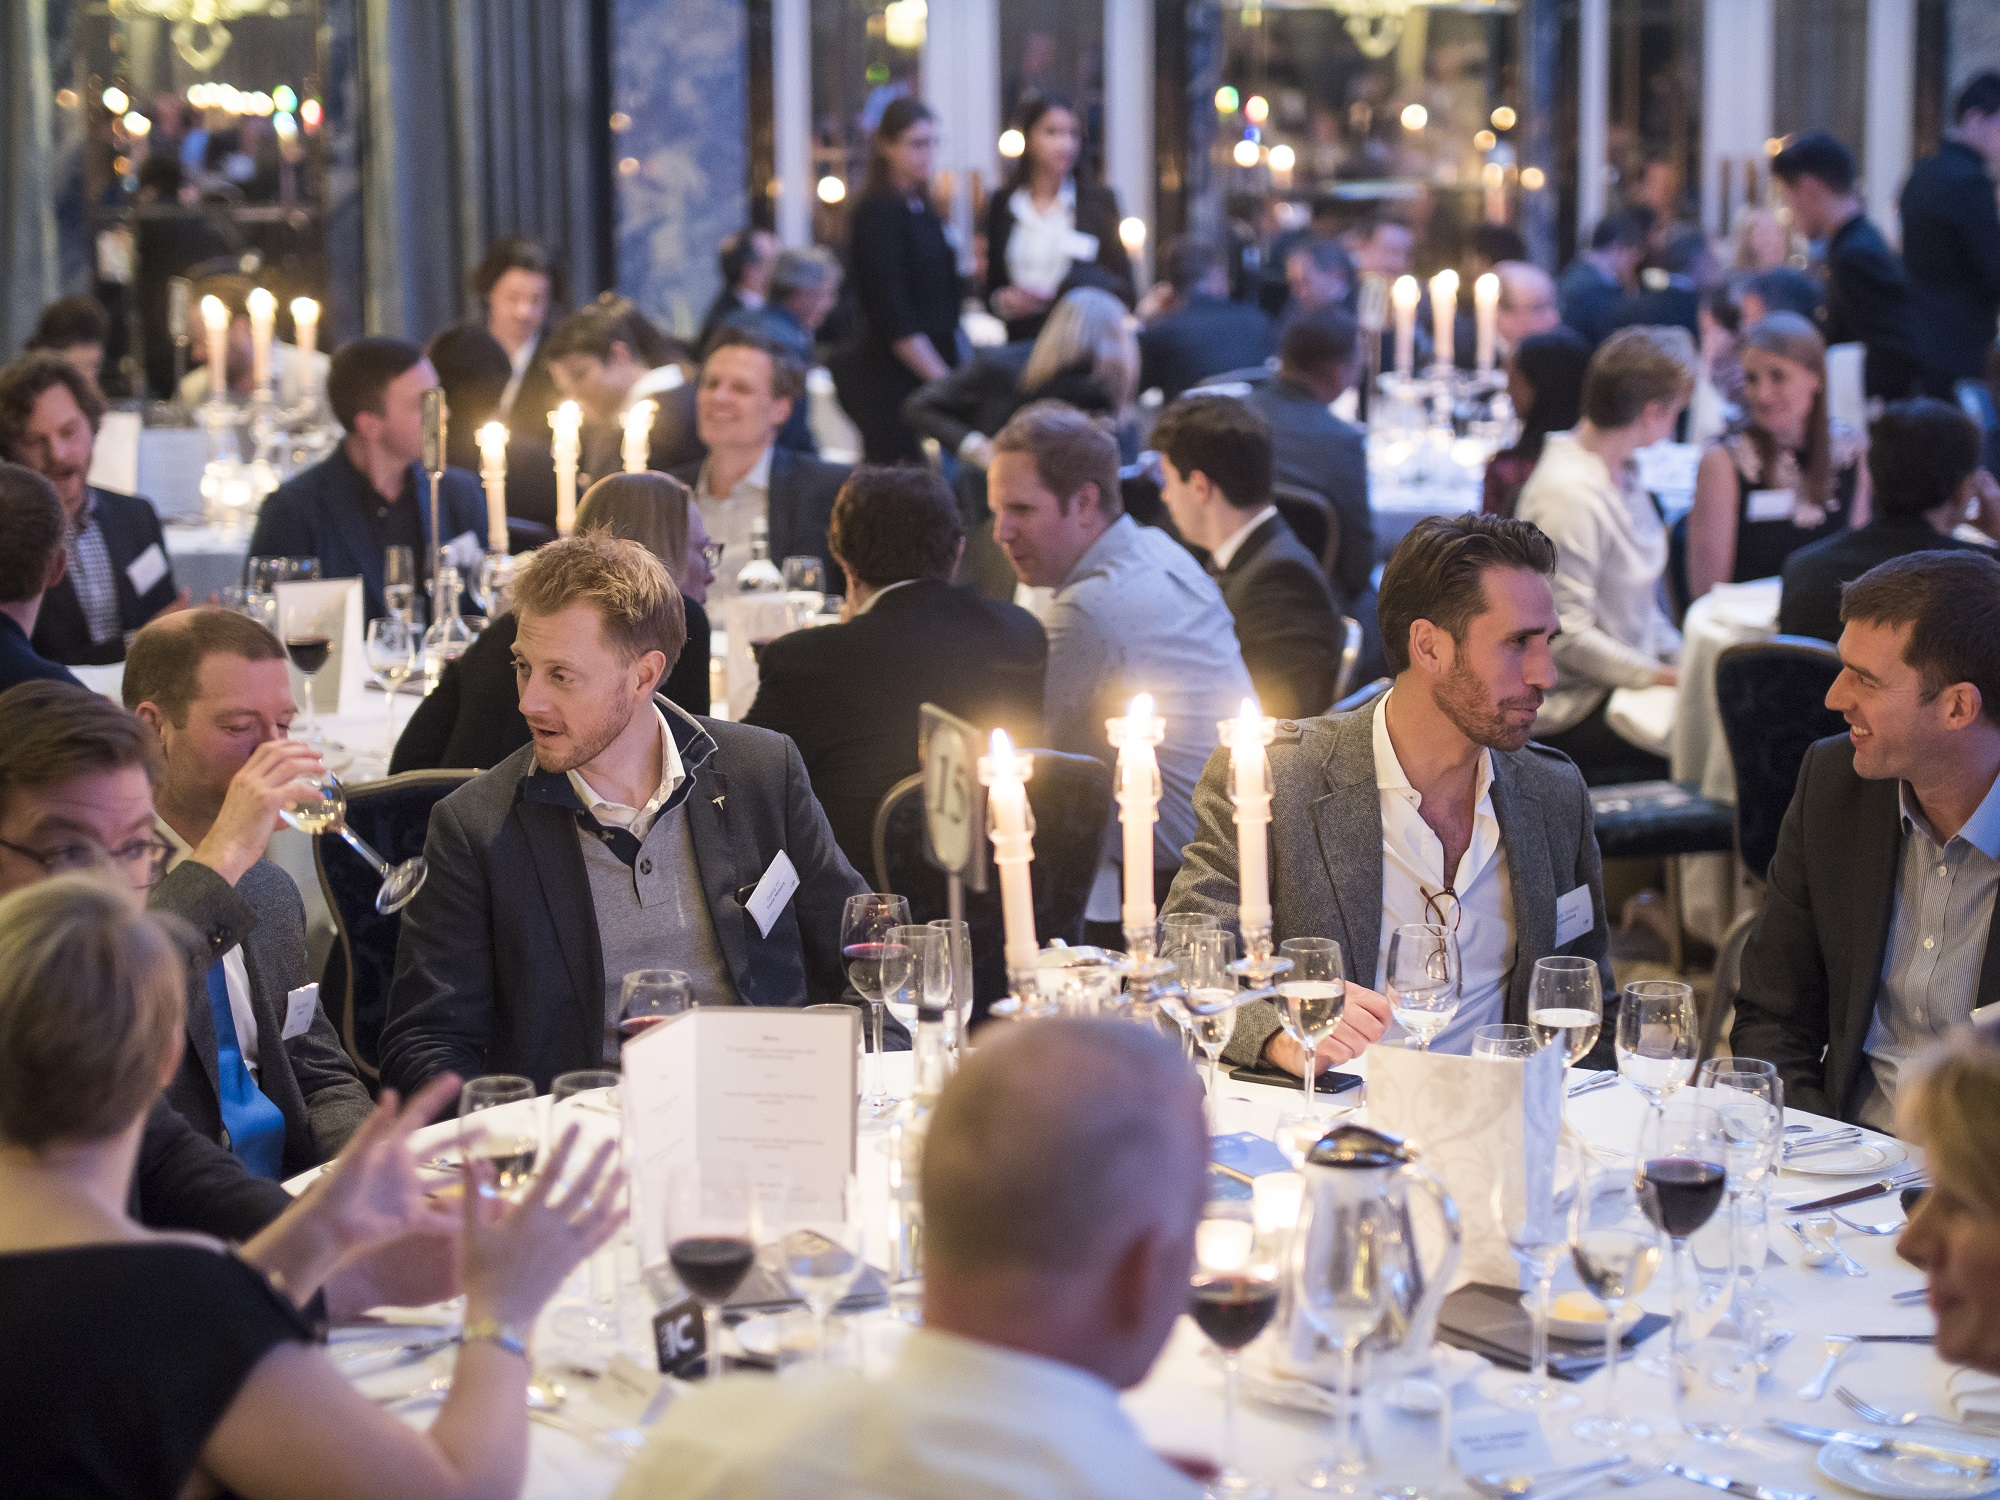 The-Up-Group-Digital-Masters-Dinner-London-2018 (2).jpg